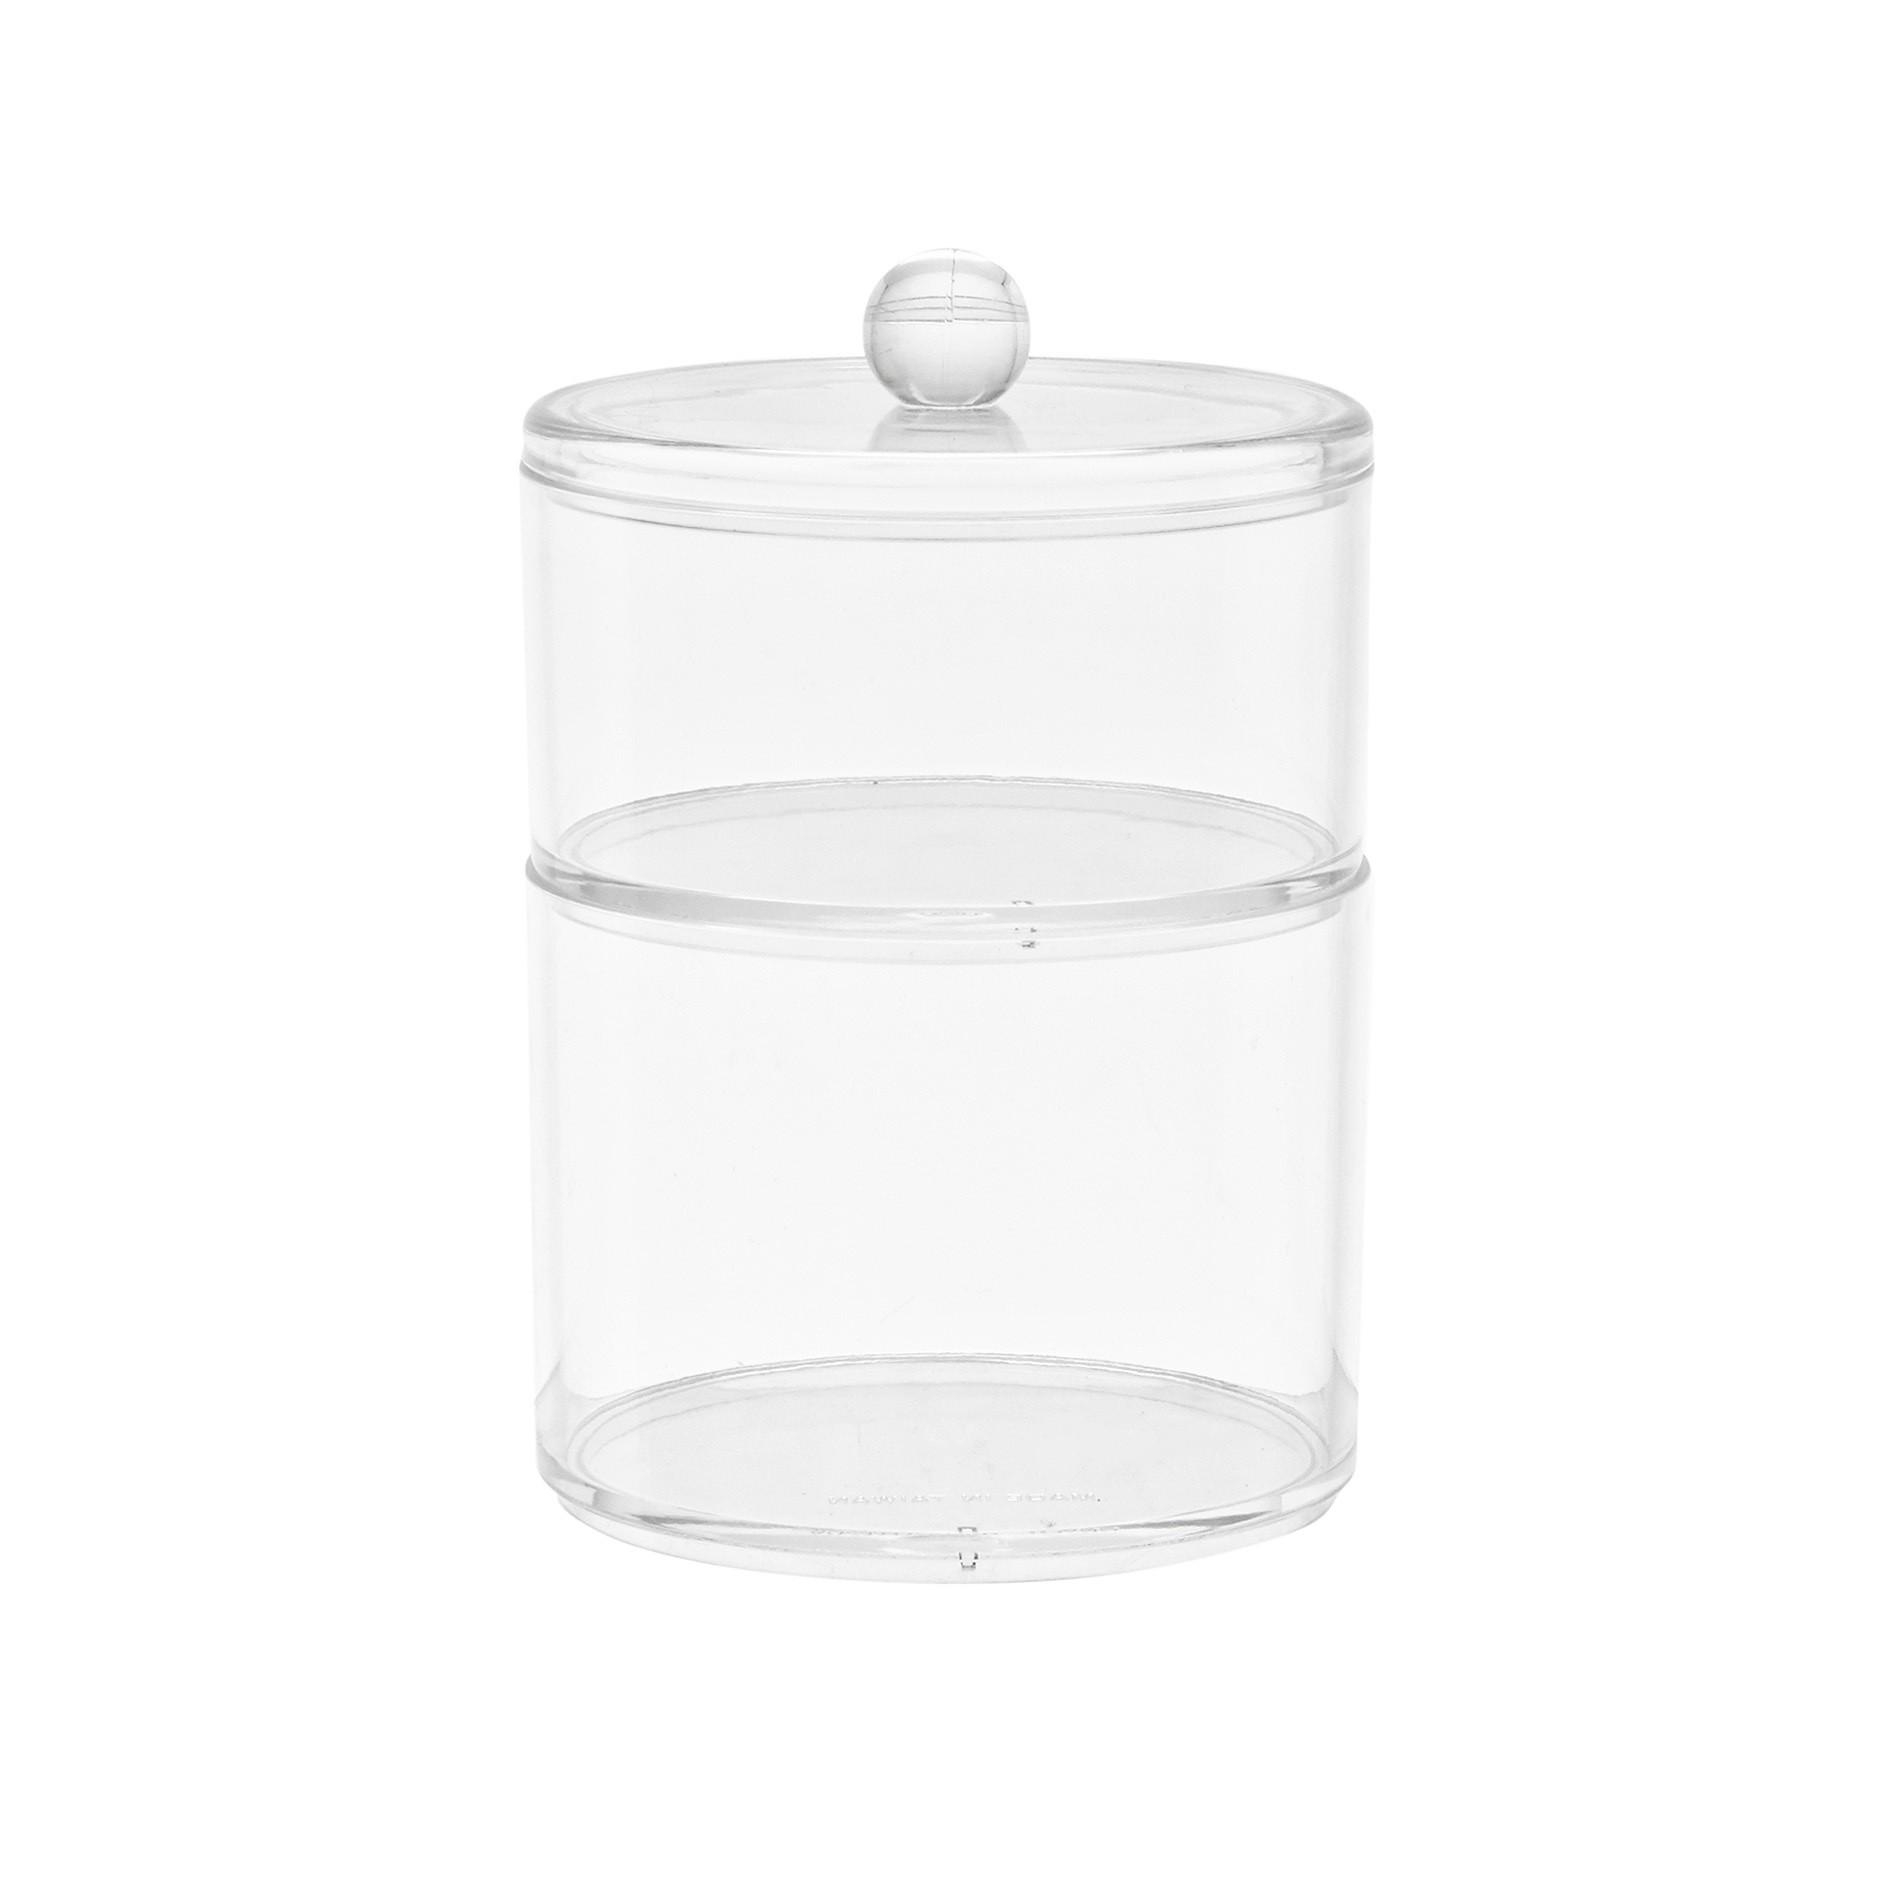 Storage 2 ripiani in vetro, Trasparente, large image number 0